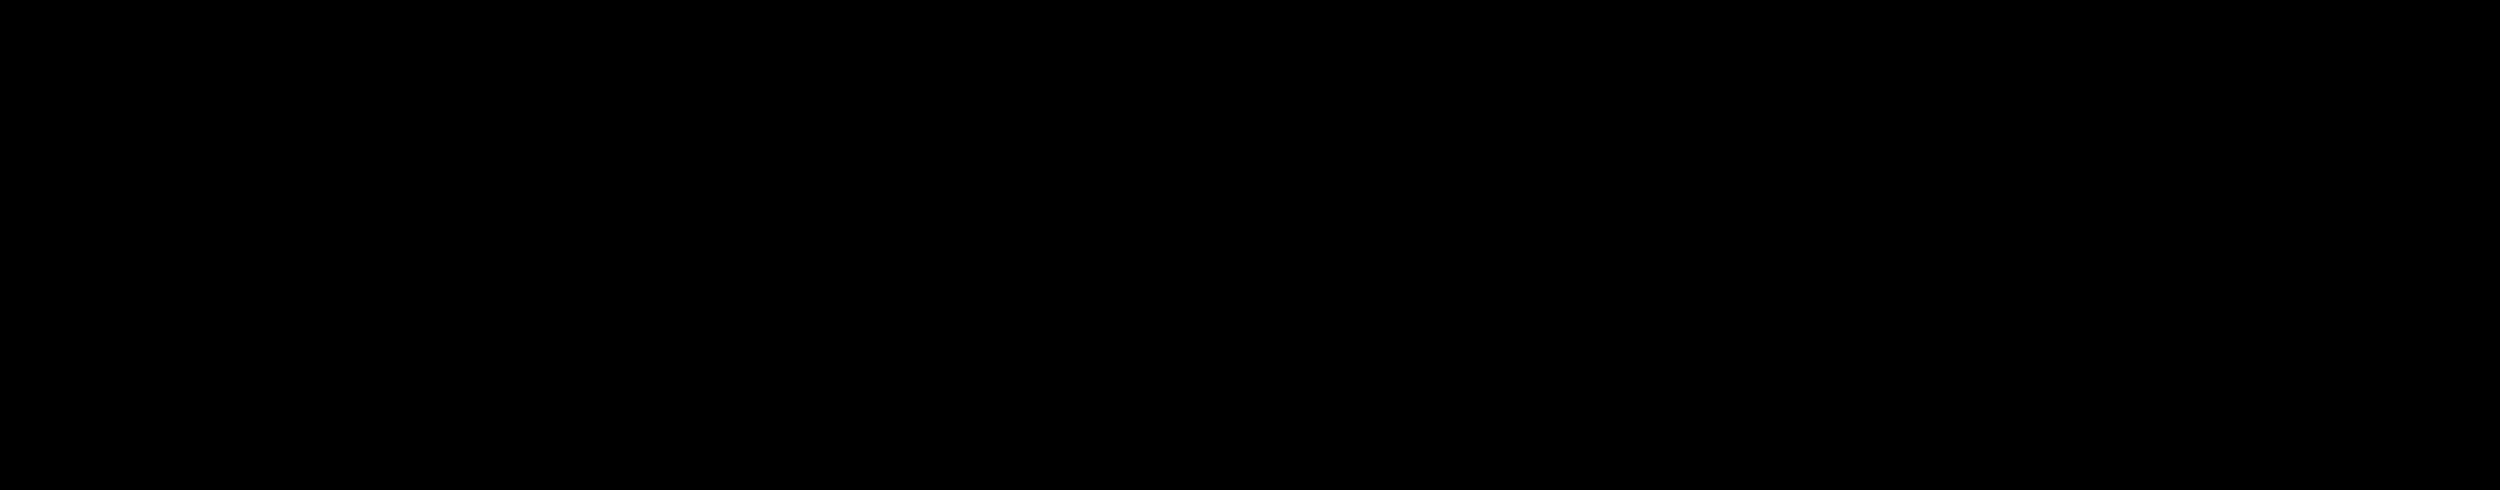 JUSTINE ROBBINS_horizontal_black.png